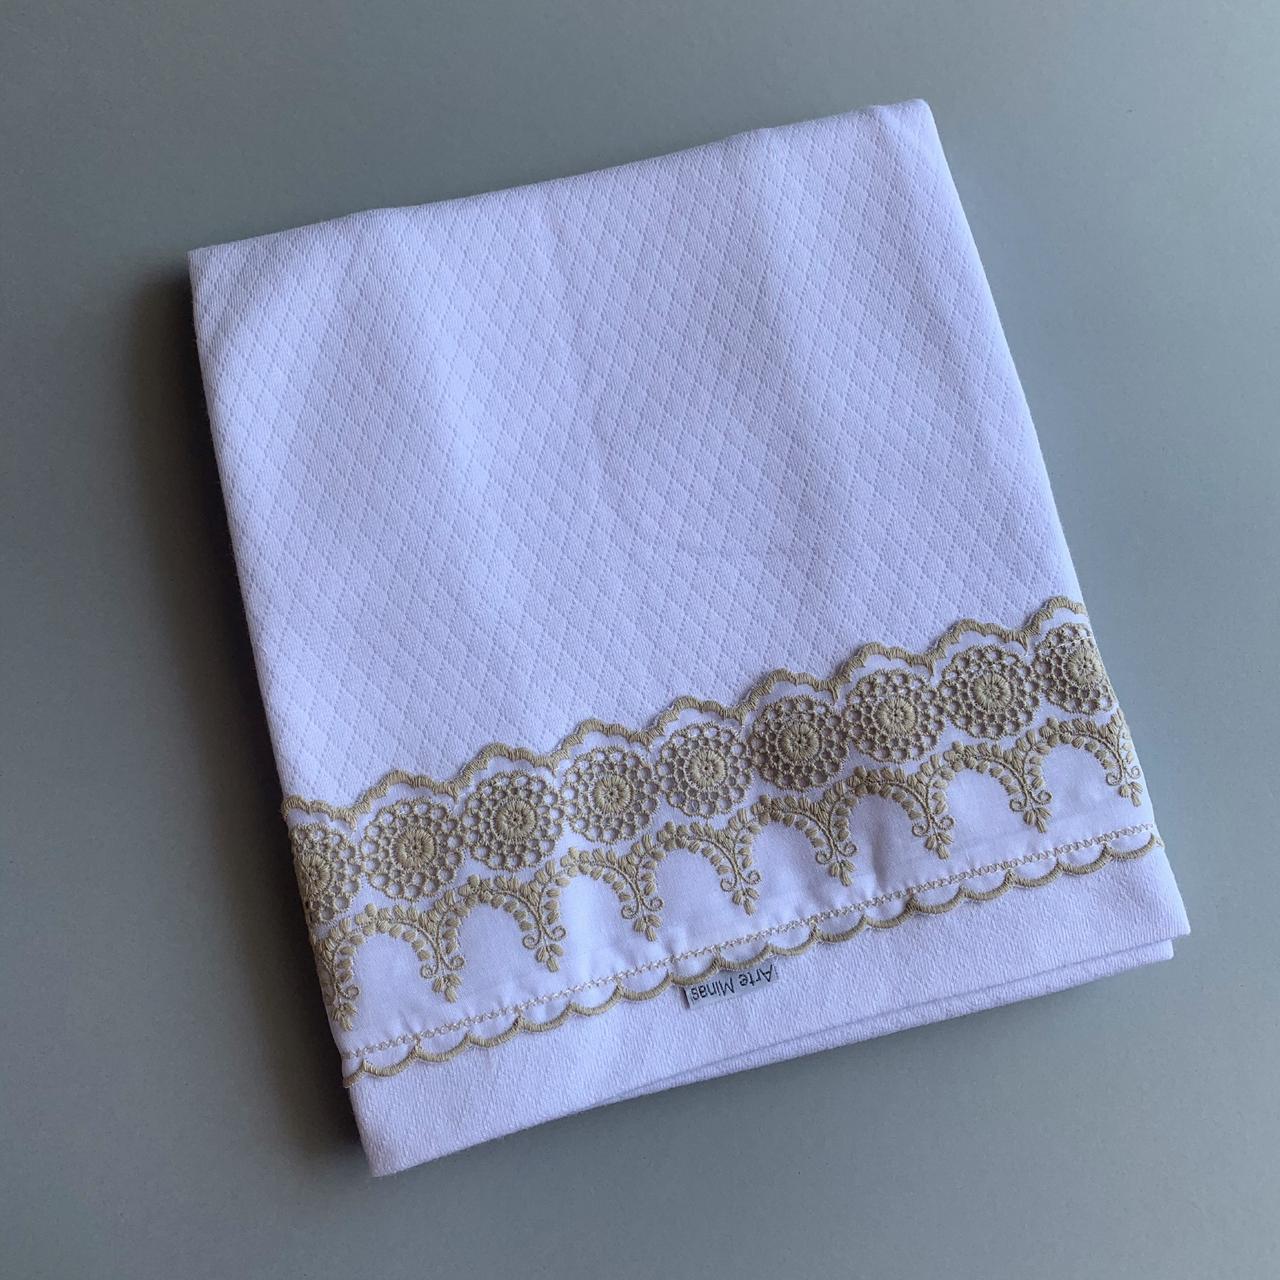 Cobertor ( mantinha leve ) Amor Eterno